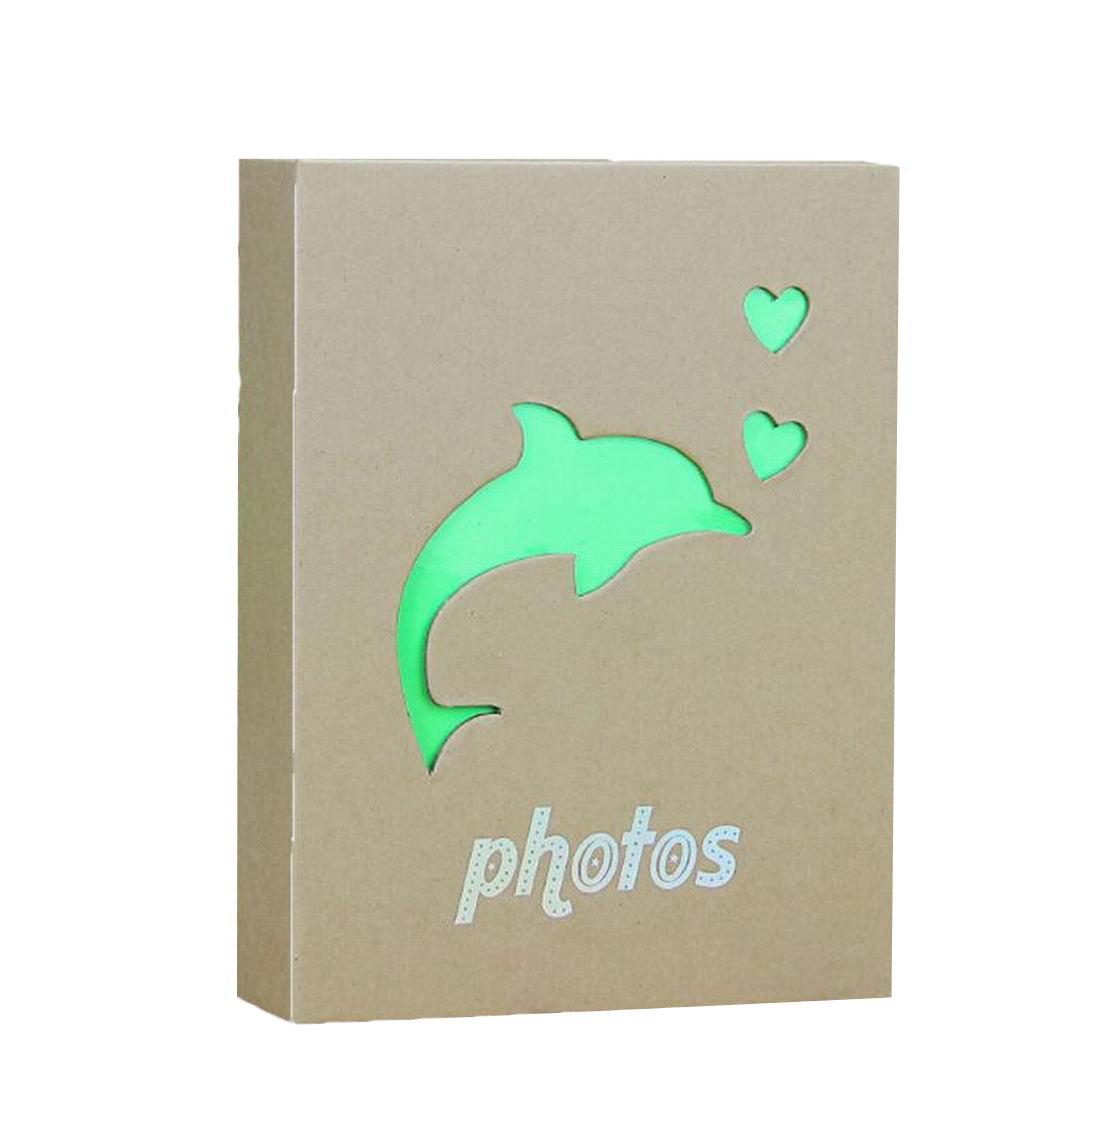 Wei Long Beautiful Photo Album Hold 200 Pockets, 3.5x5 Photos, (Elephant) 3.5x5 Photos